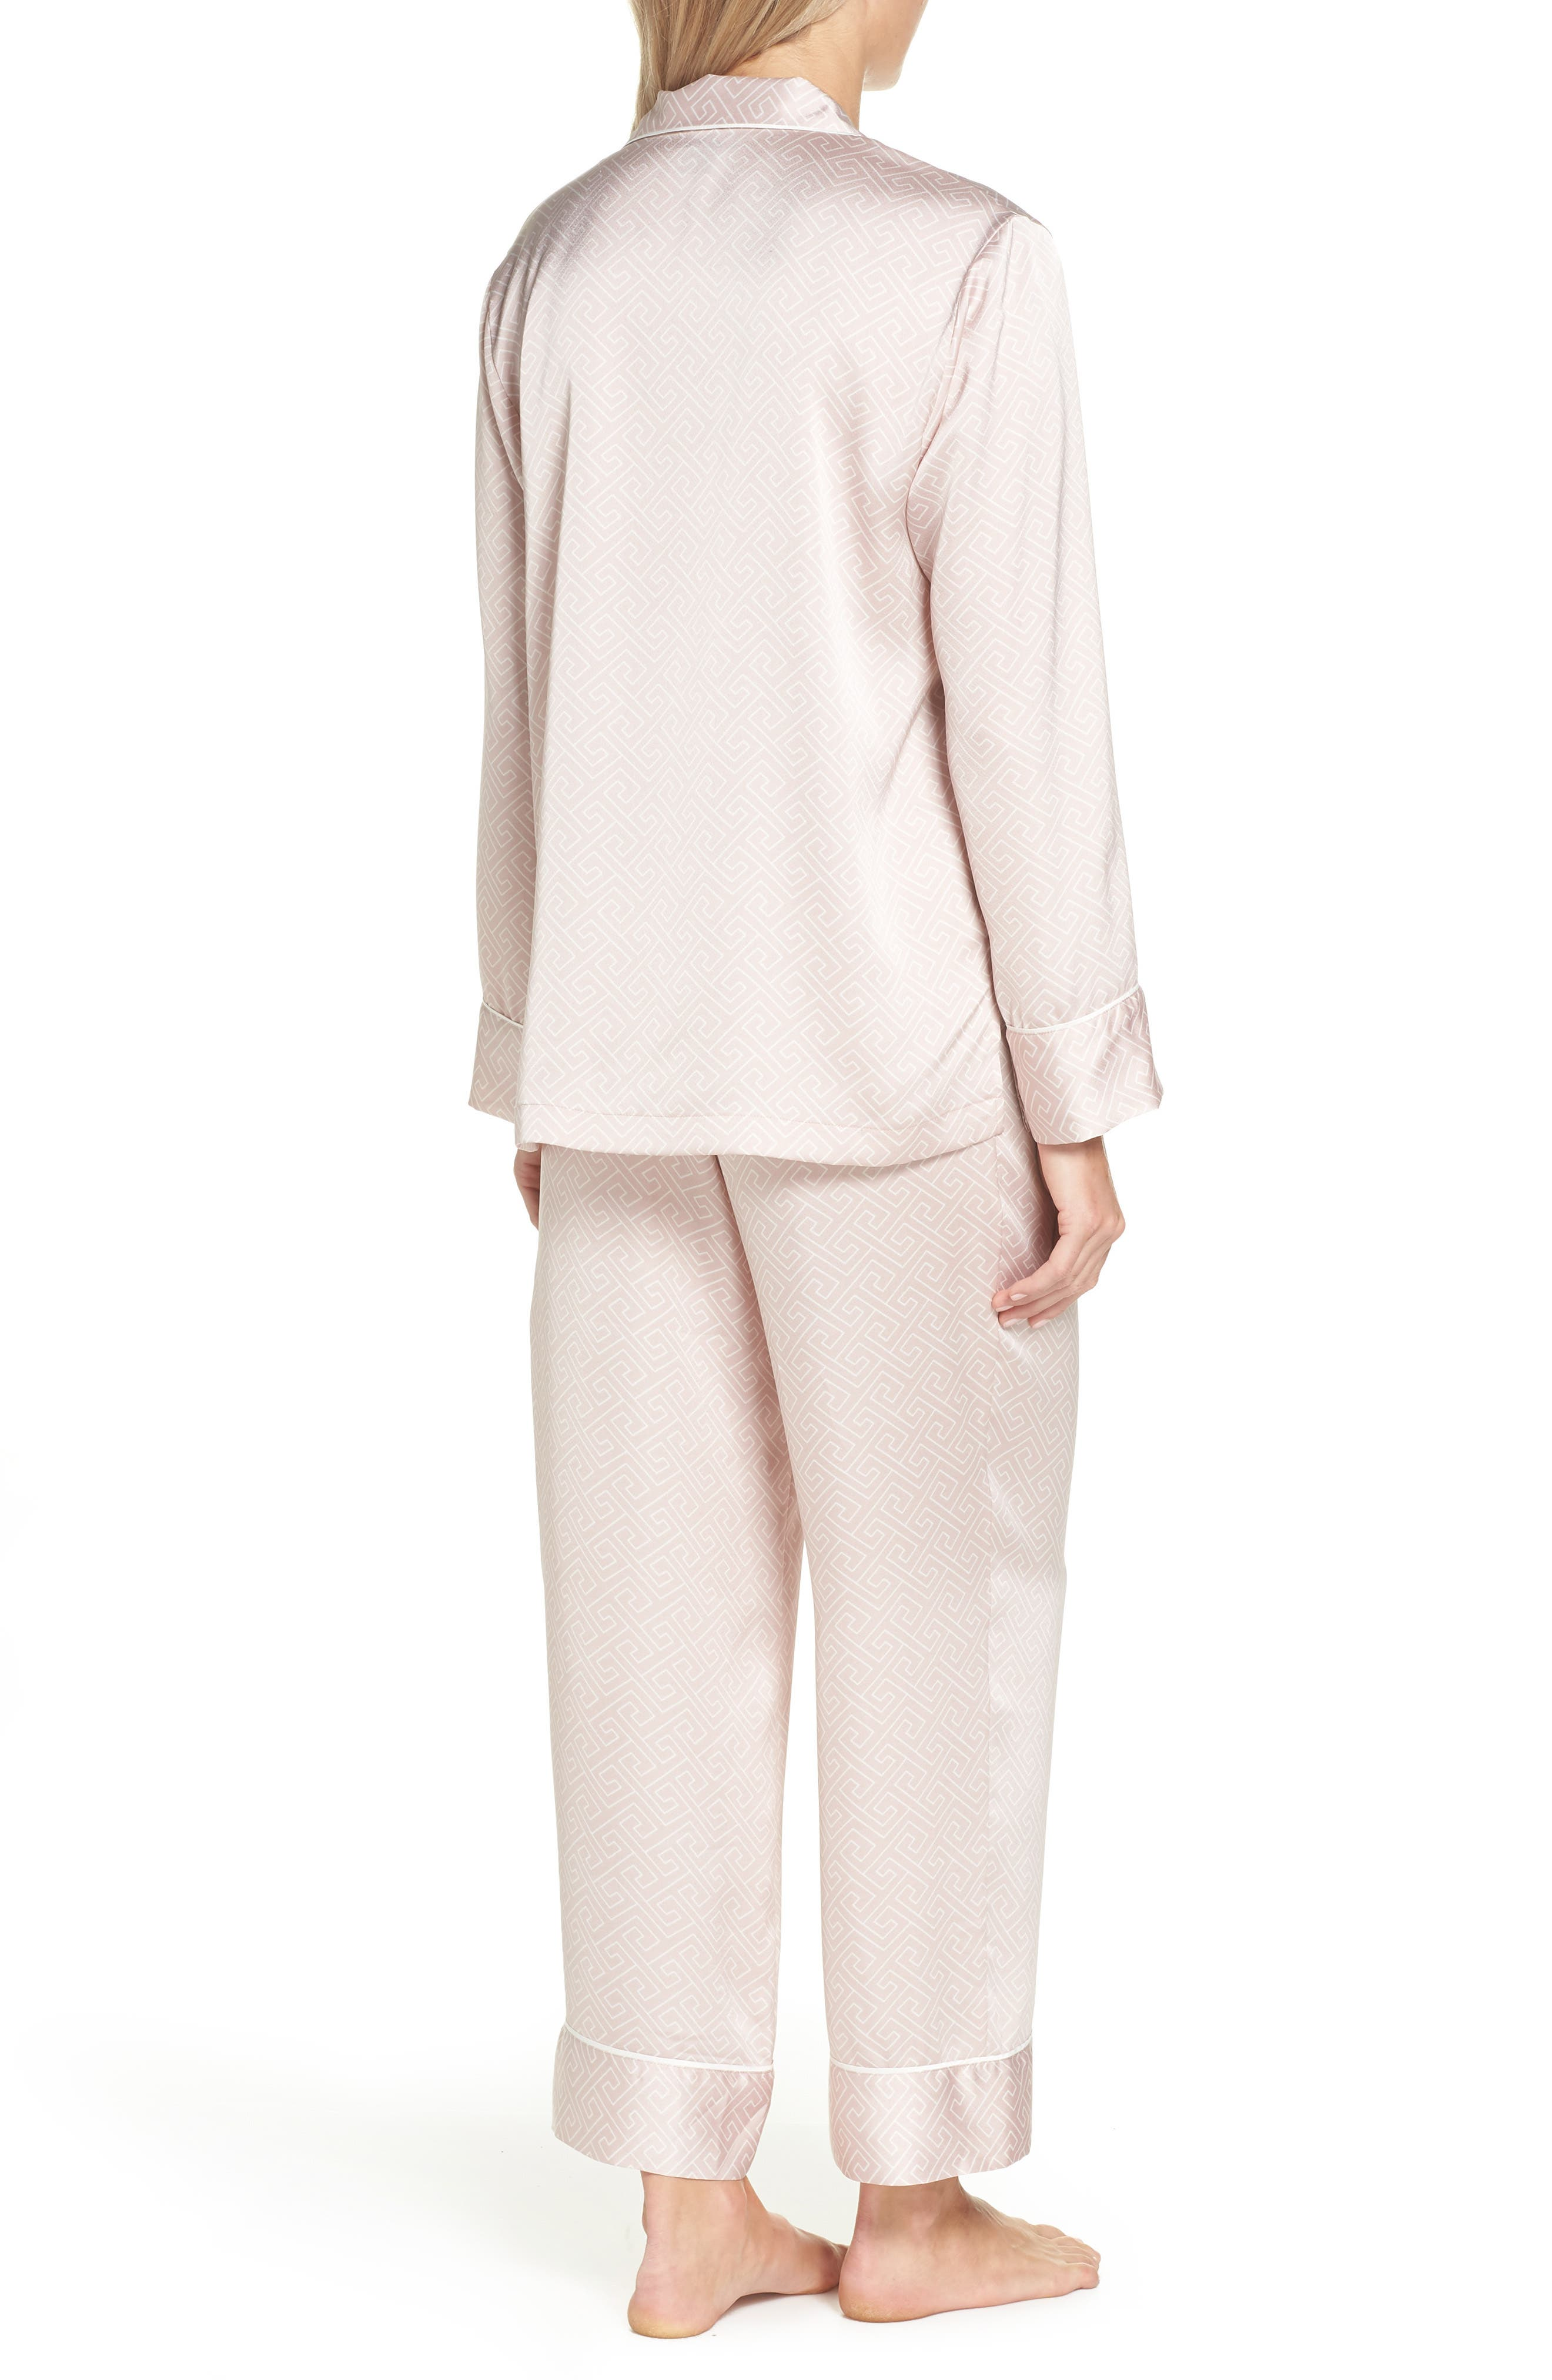 Labyrinth Satin Pajamas,                             Alternate thumbnail 2, color,                             ROSE BEIGE